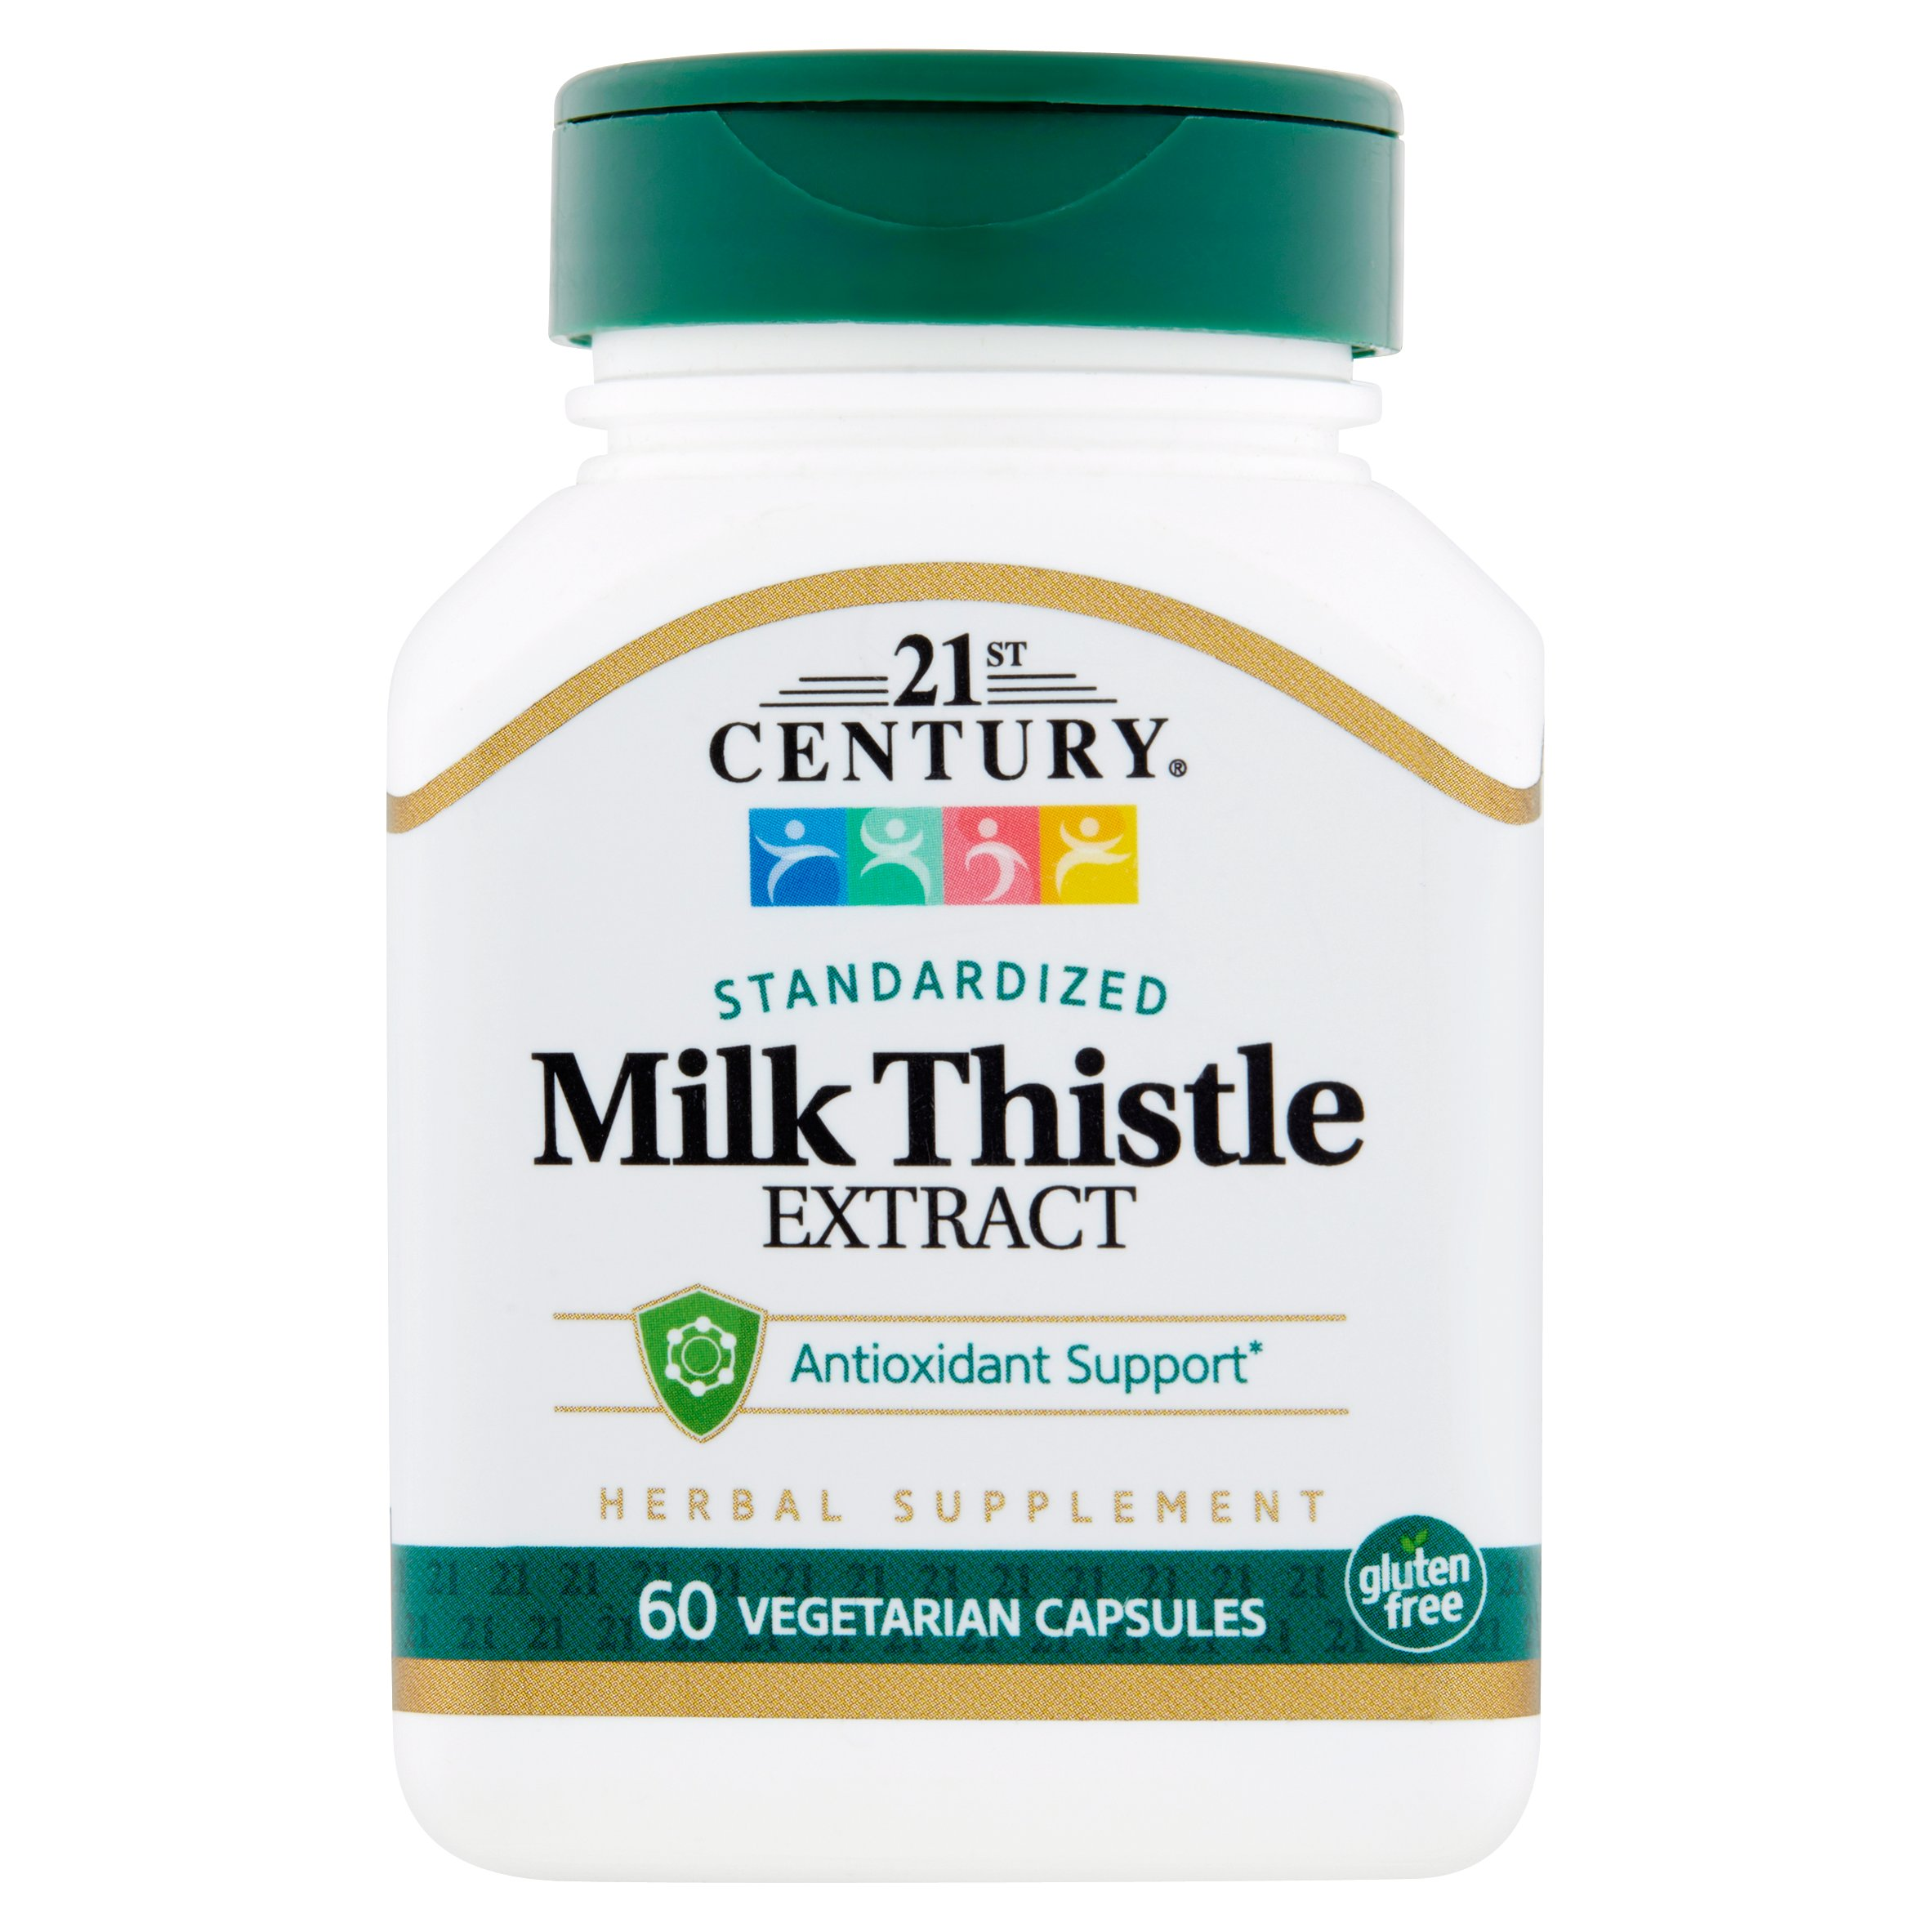 21st Century Milk Thistle Extract 175mg Capsules, 60 Ct